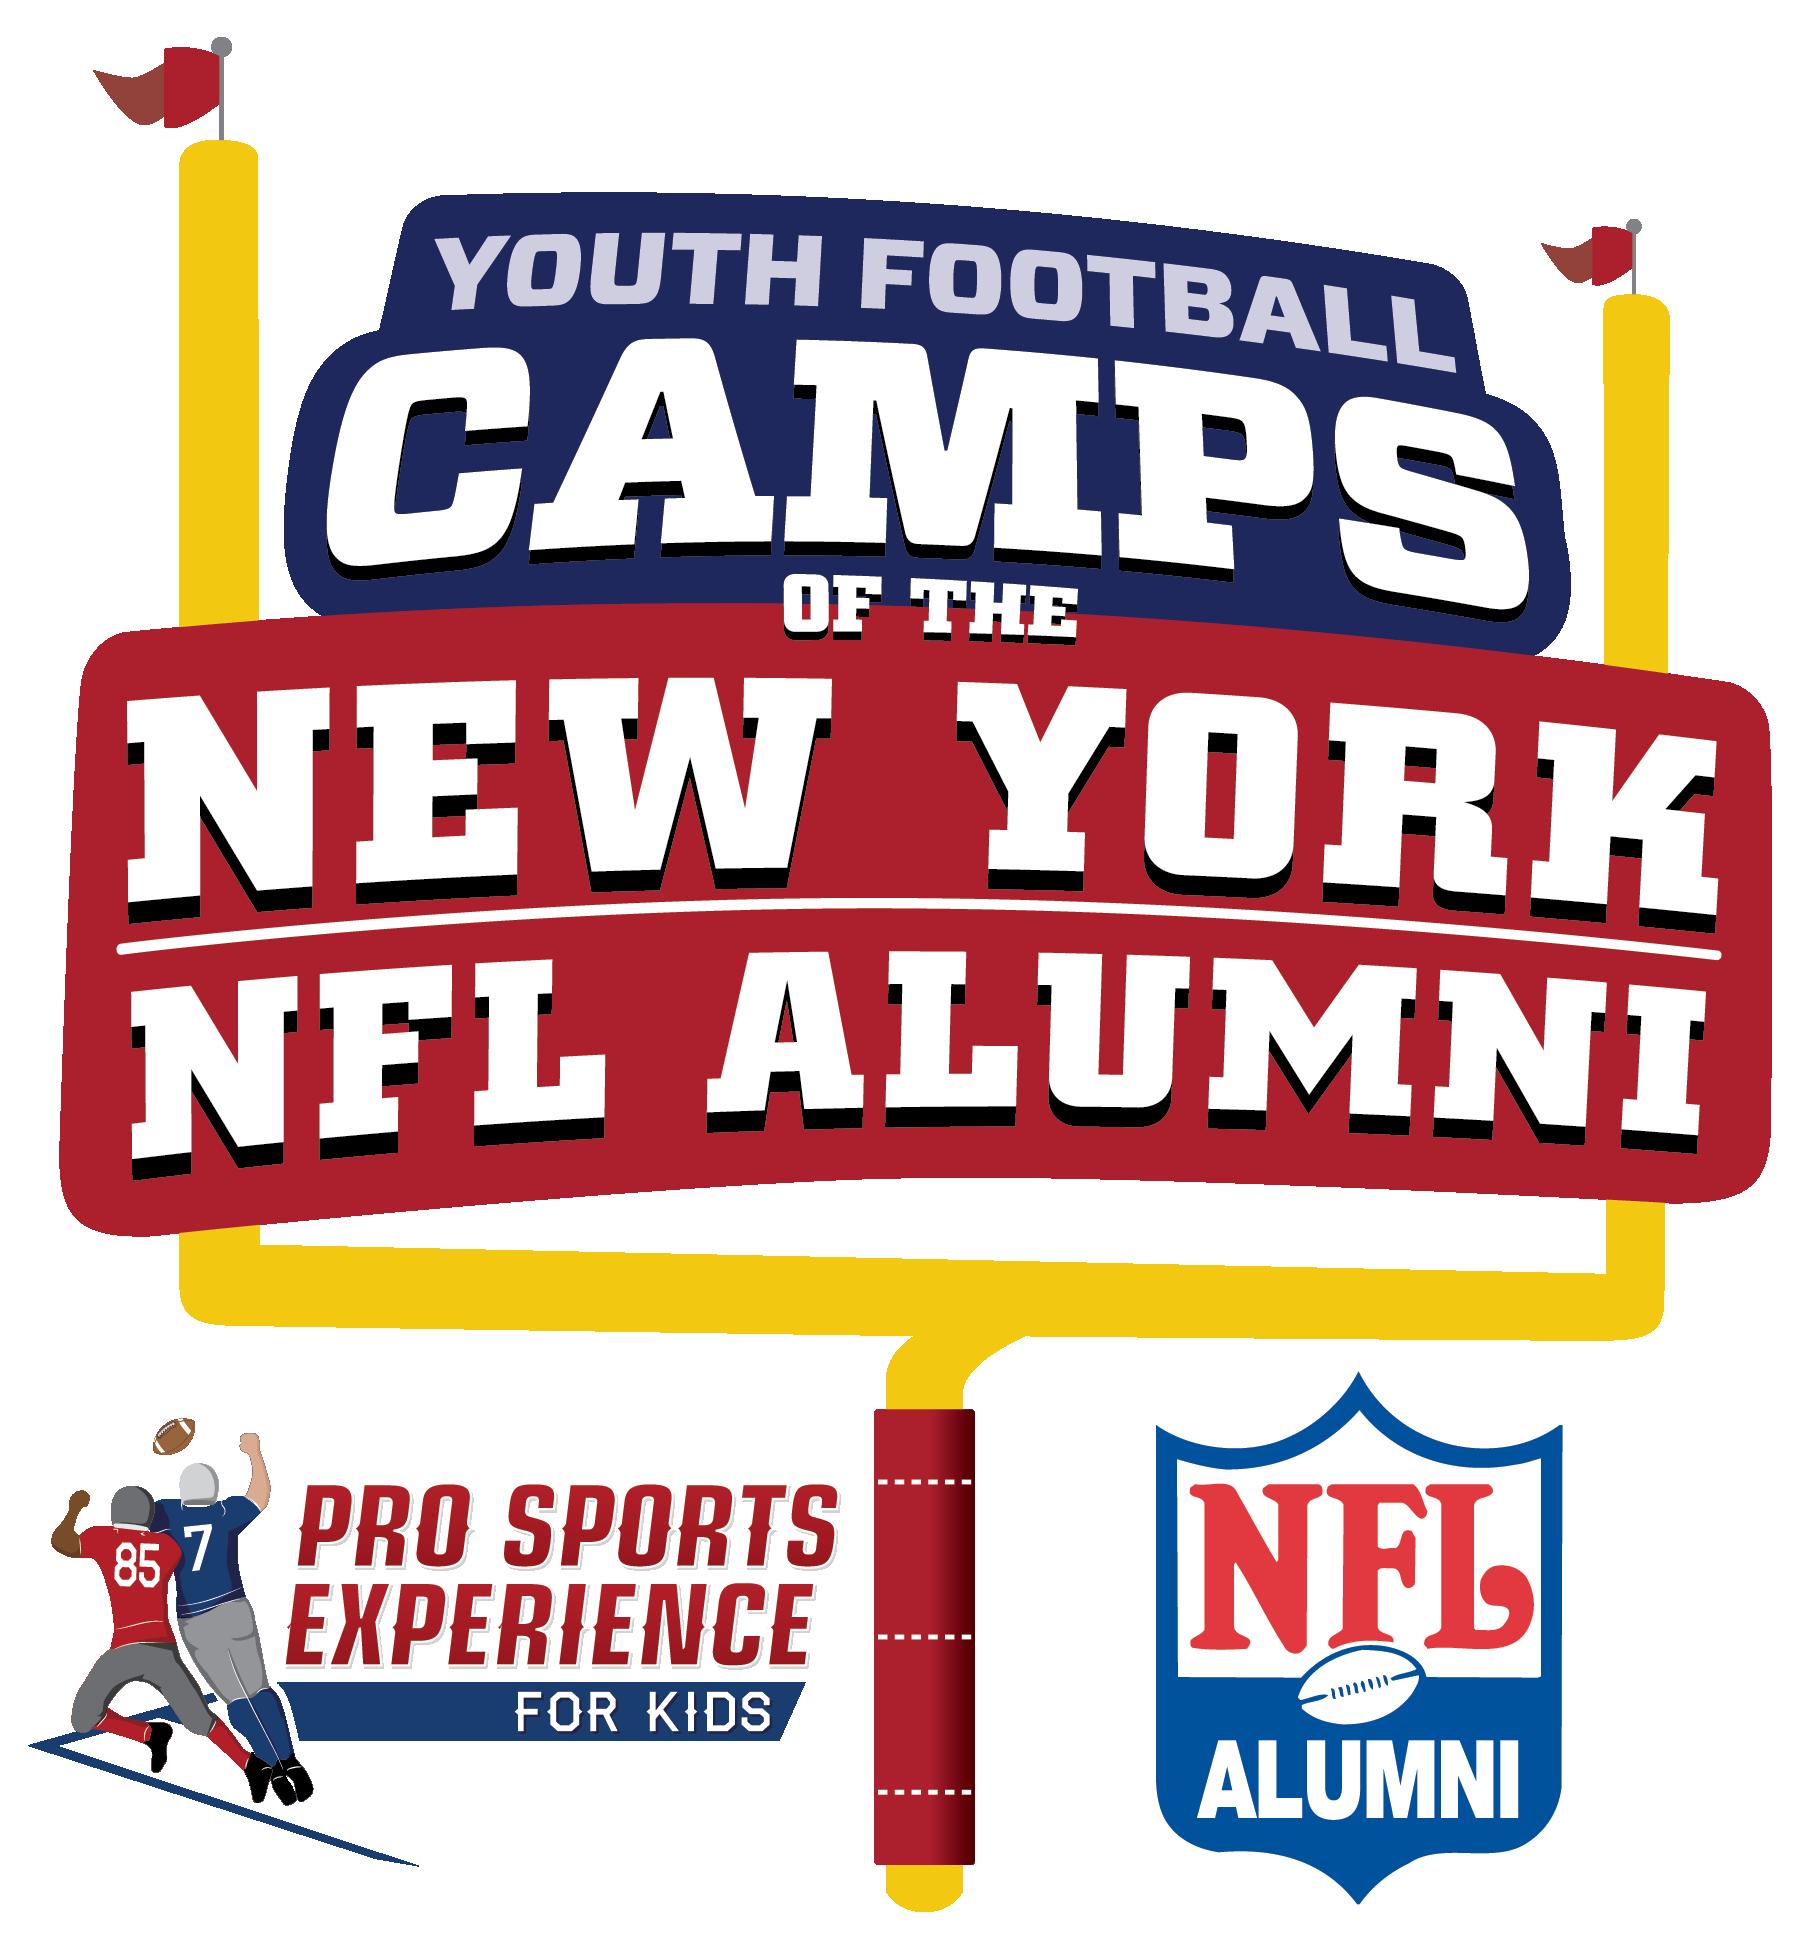 New York NFL Alumni Hero Youth Football Camps - Livingston